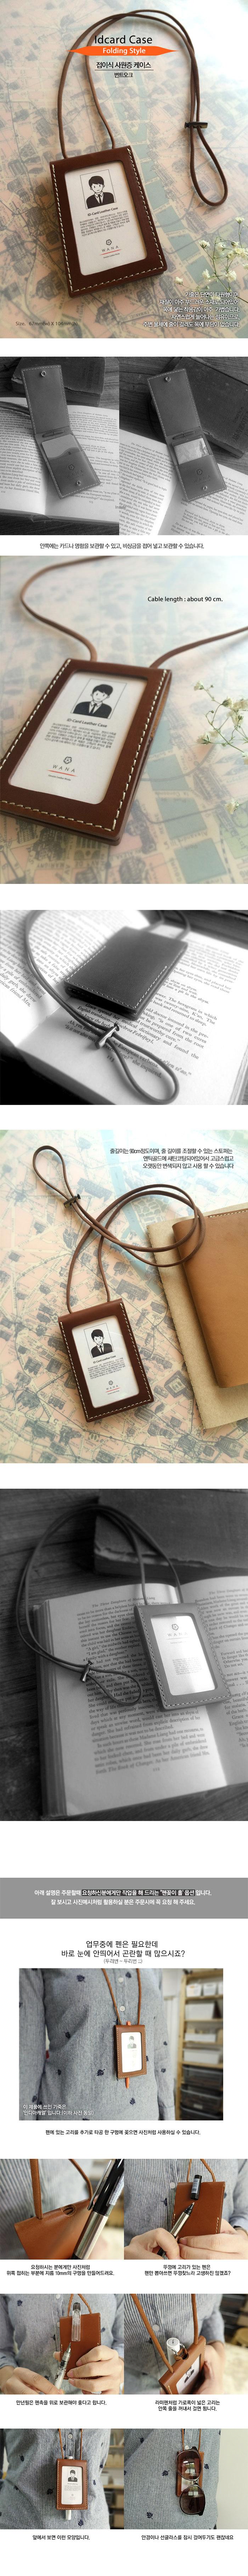 ID카드.사원증.신분증 가죽케이스(세로용)- Idcard Case (번트오크) - 와나크래프트, 35,000원, 네임택, ID카드